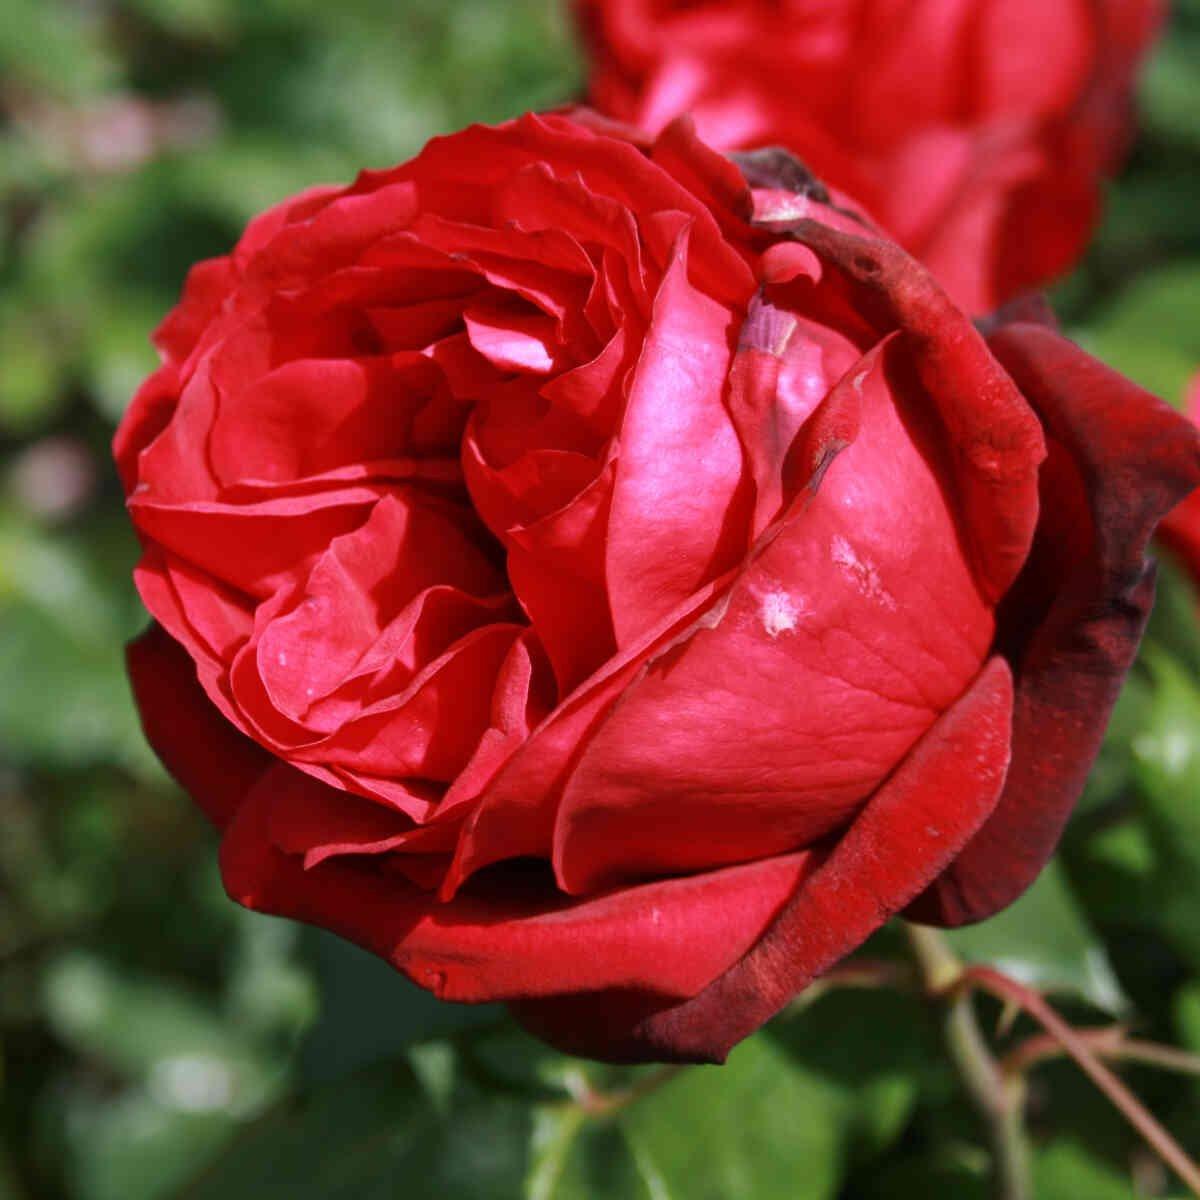 Mørkerød rosen blomst i Admiral rose